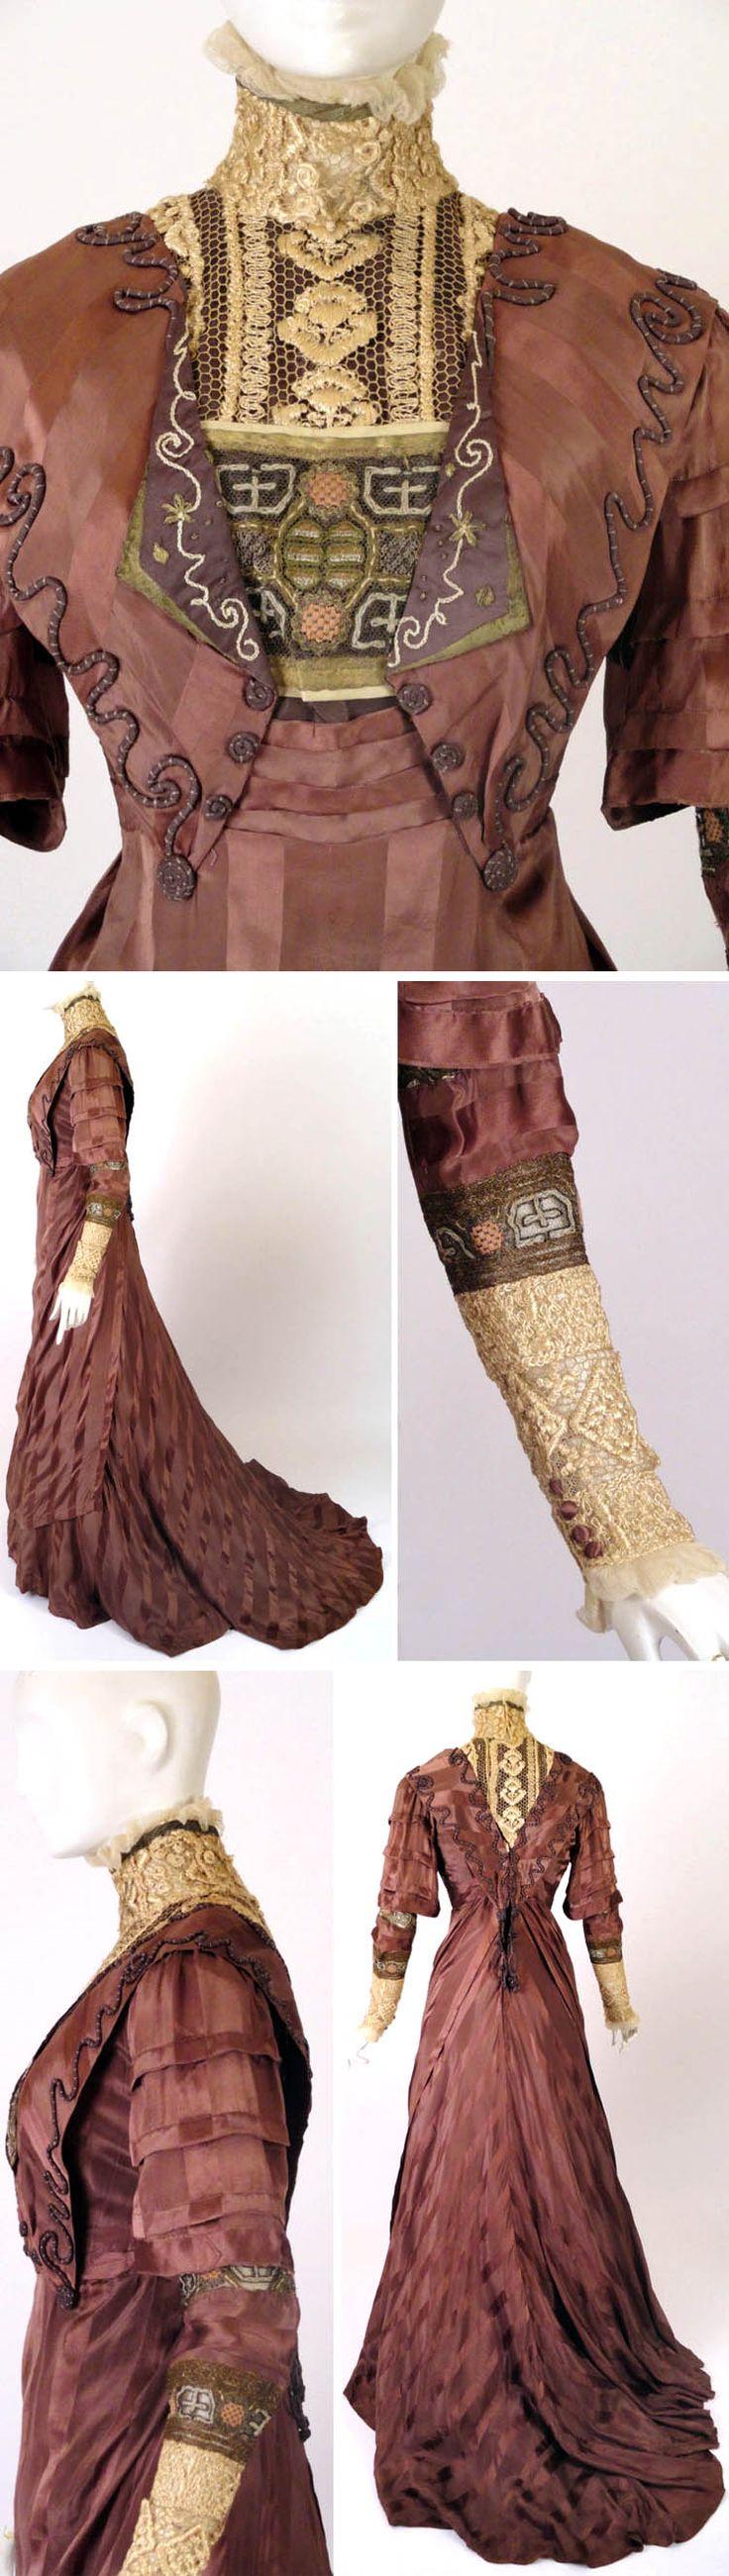 Dinner gown, J. Franken, Brooklyn, ca. 1910. Mauve silk satin stripe. Embroidered yoke in silk crewel w/brown taffeta facing. Gold ribbon & chiffon ruffle at collar. Embroidered bullion net across yoke w/small revers, embroidered & trimmed in gold bullion. Natural waistline. Draped apron front panel. Bell-shaped sleeves w/horizontal tucks; under-sleeves in silk & bullion embroidered lace, w/ivory embroidered lower sleeve edged in ivory chiffon. Vintage Martini